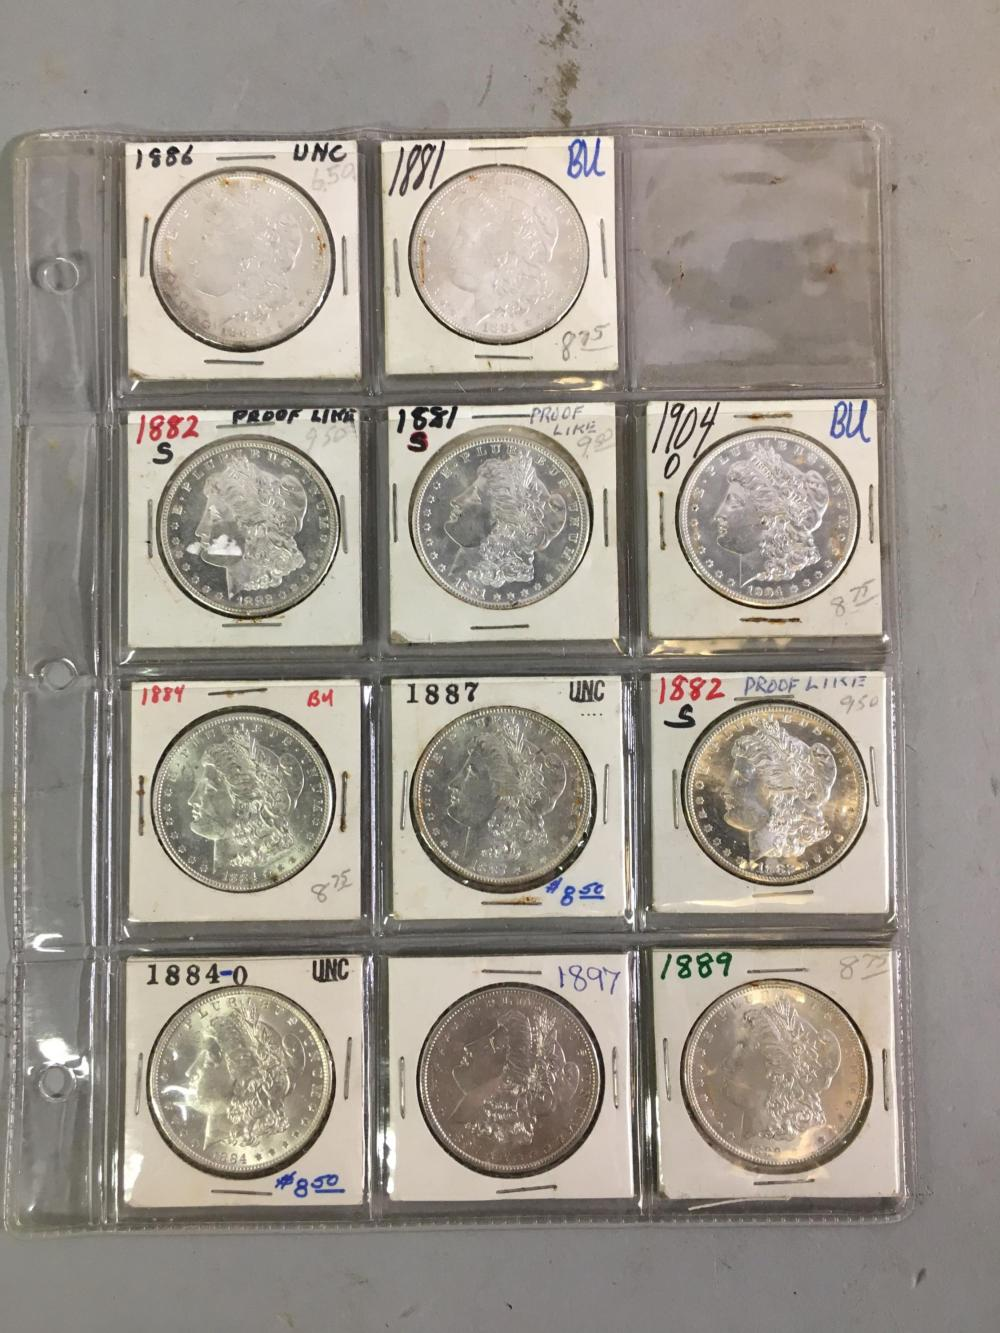 8 UNC, BU, & Proof Like Silver Morgan Dollars